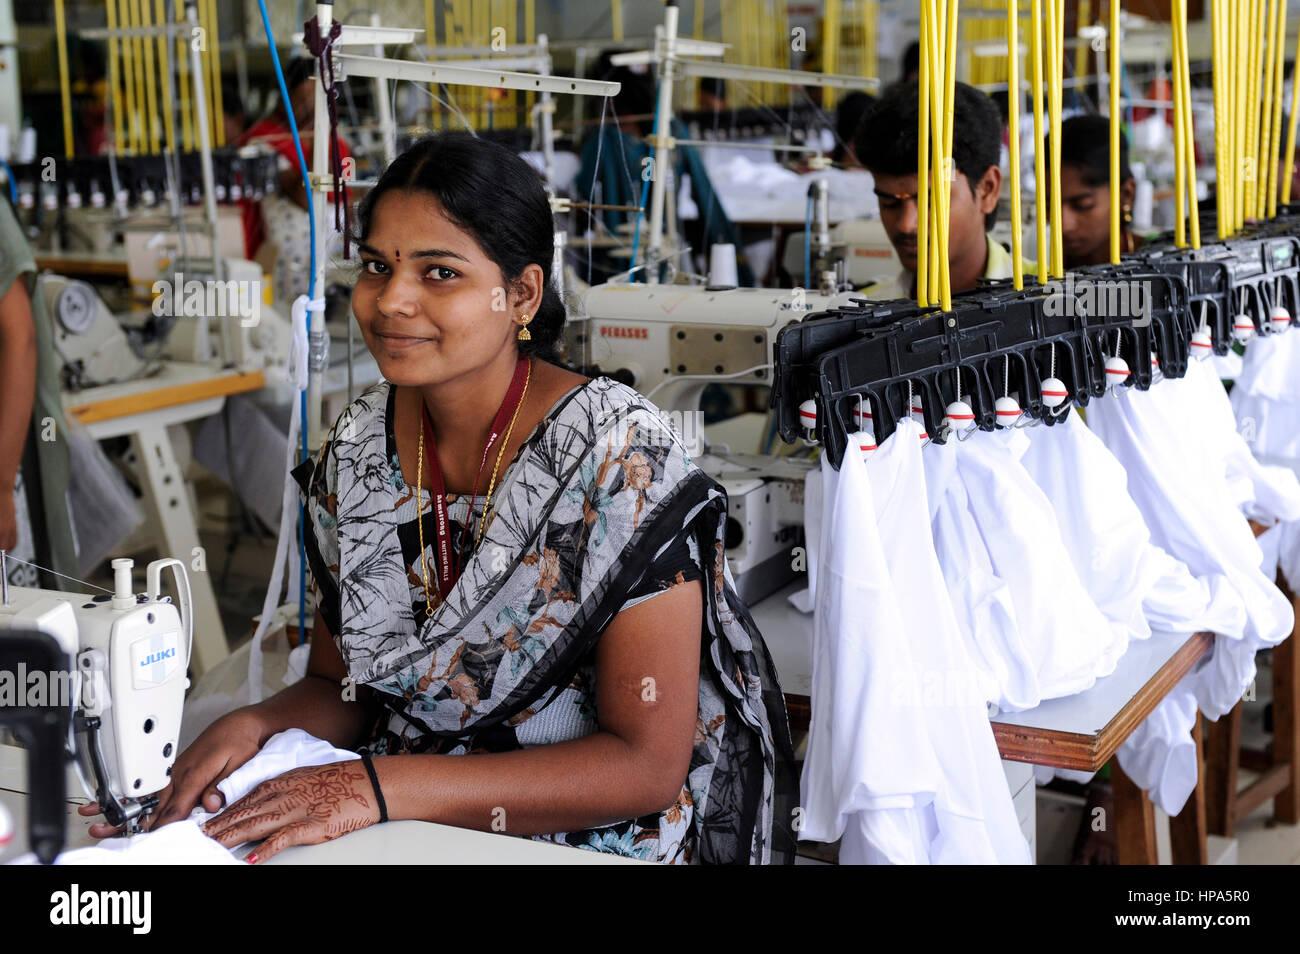 Knitting Units In Tirupur : India tirupur fair trade textile units armstrong